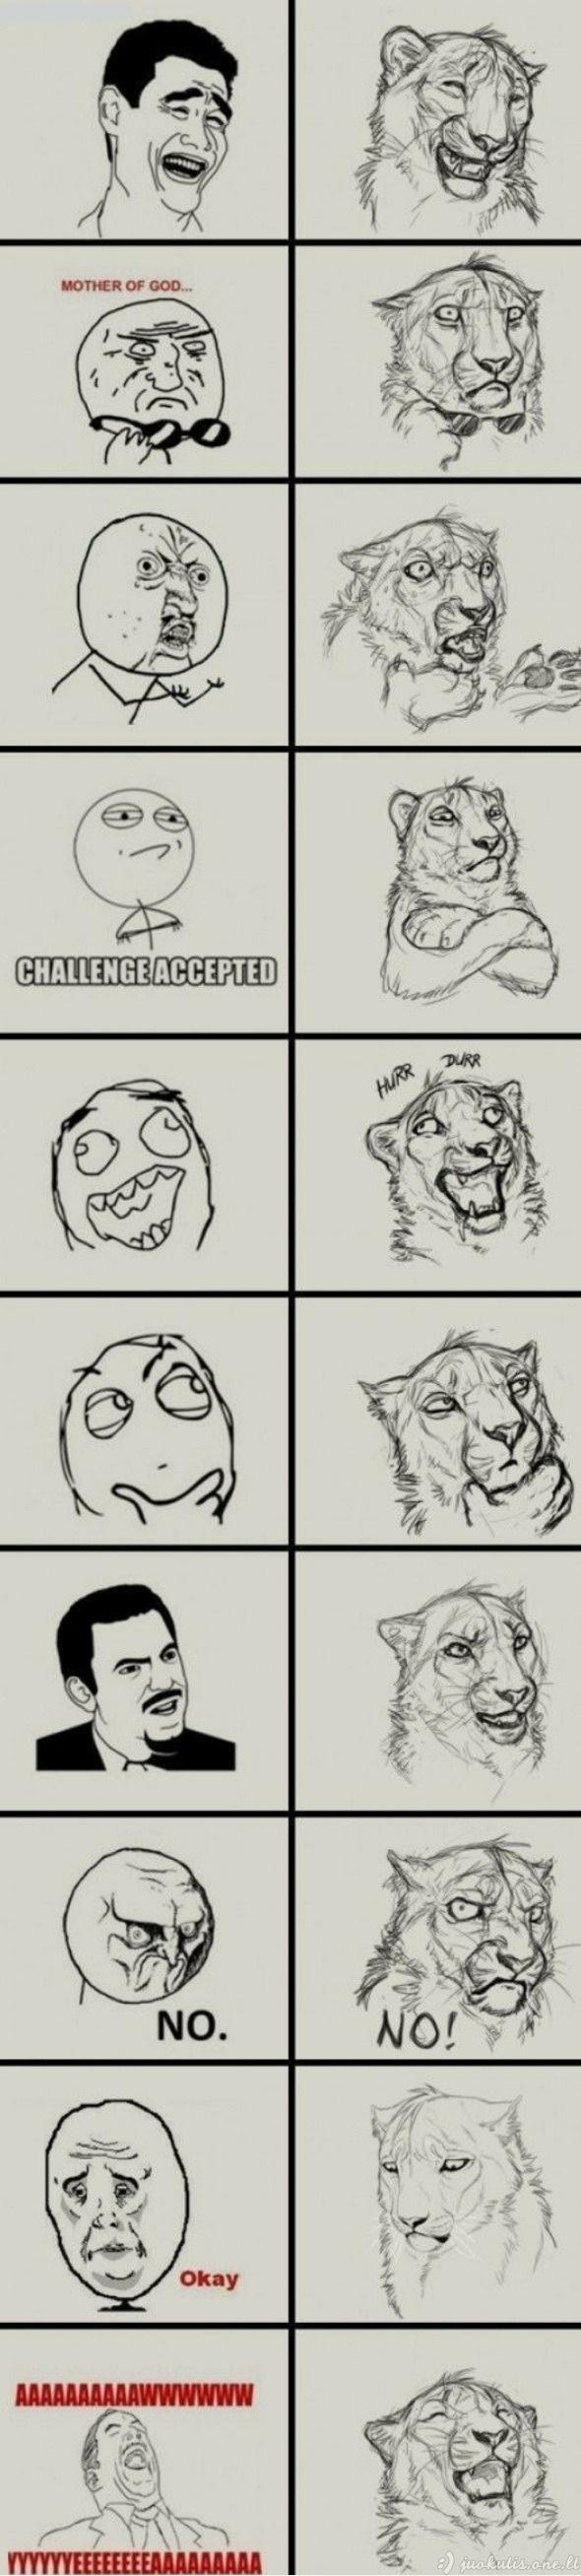 Liūtiški memai